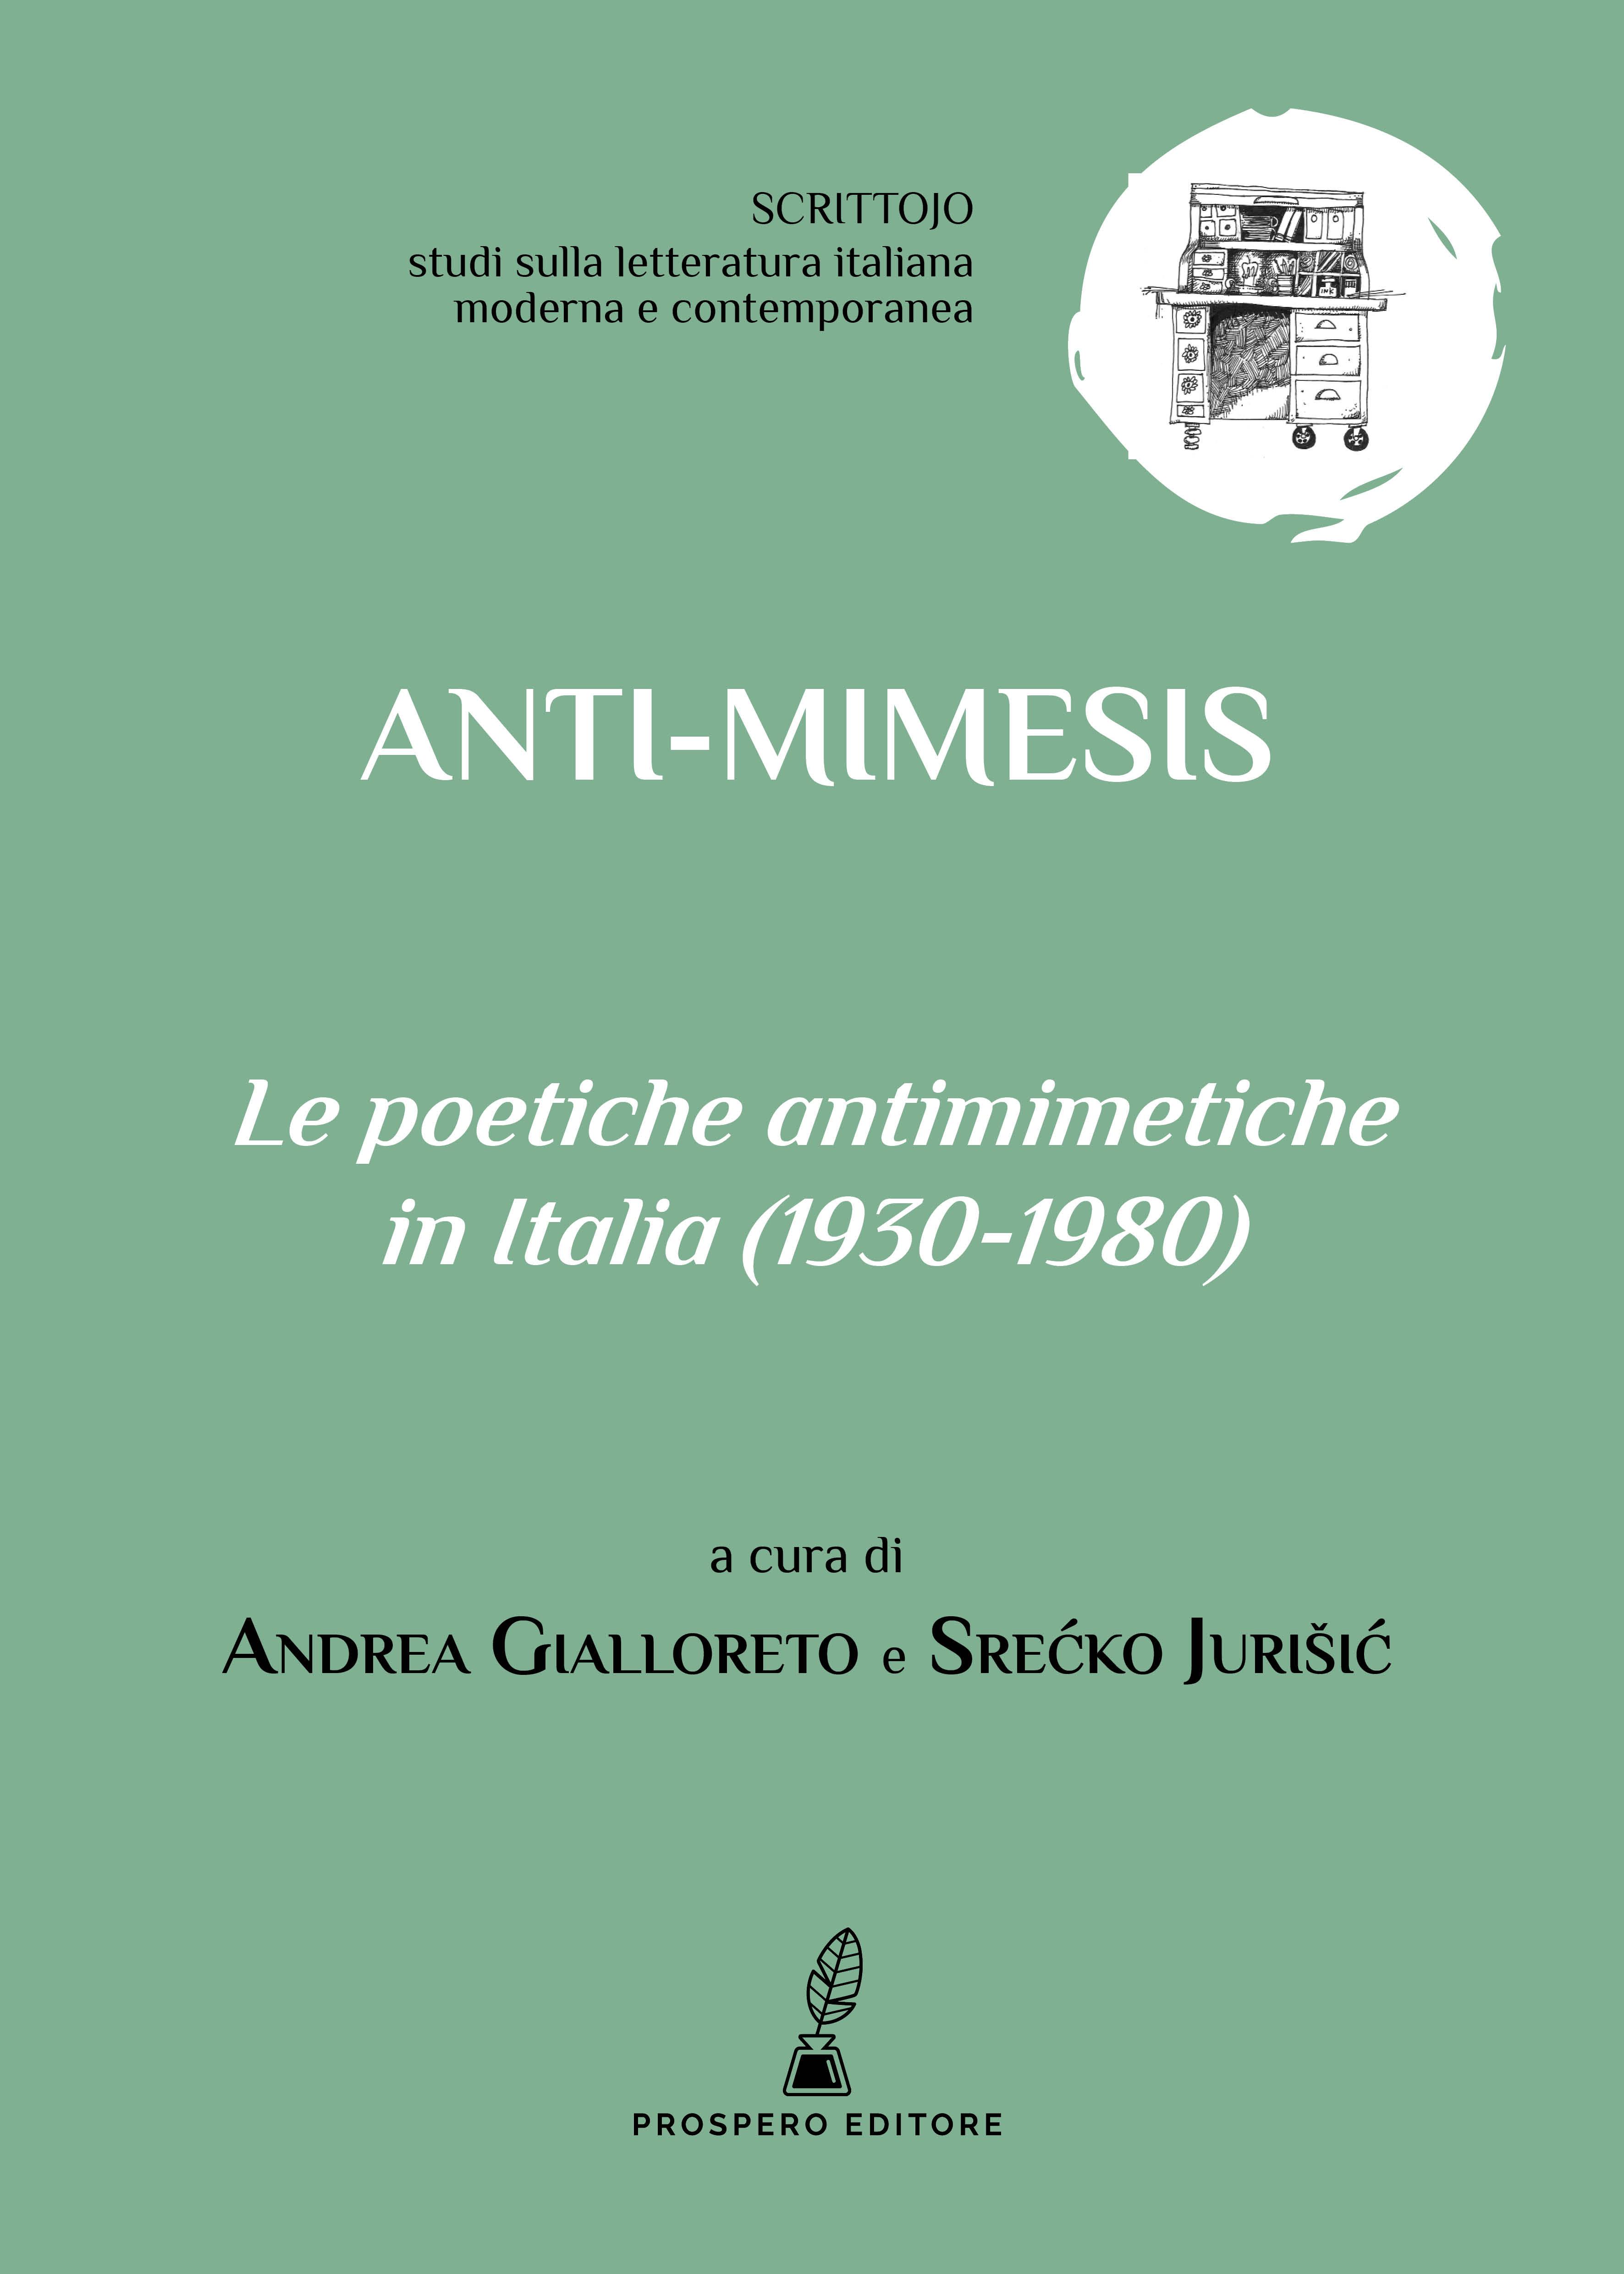 Anti-mimesis-image